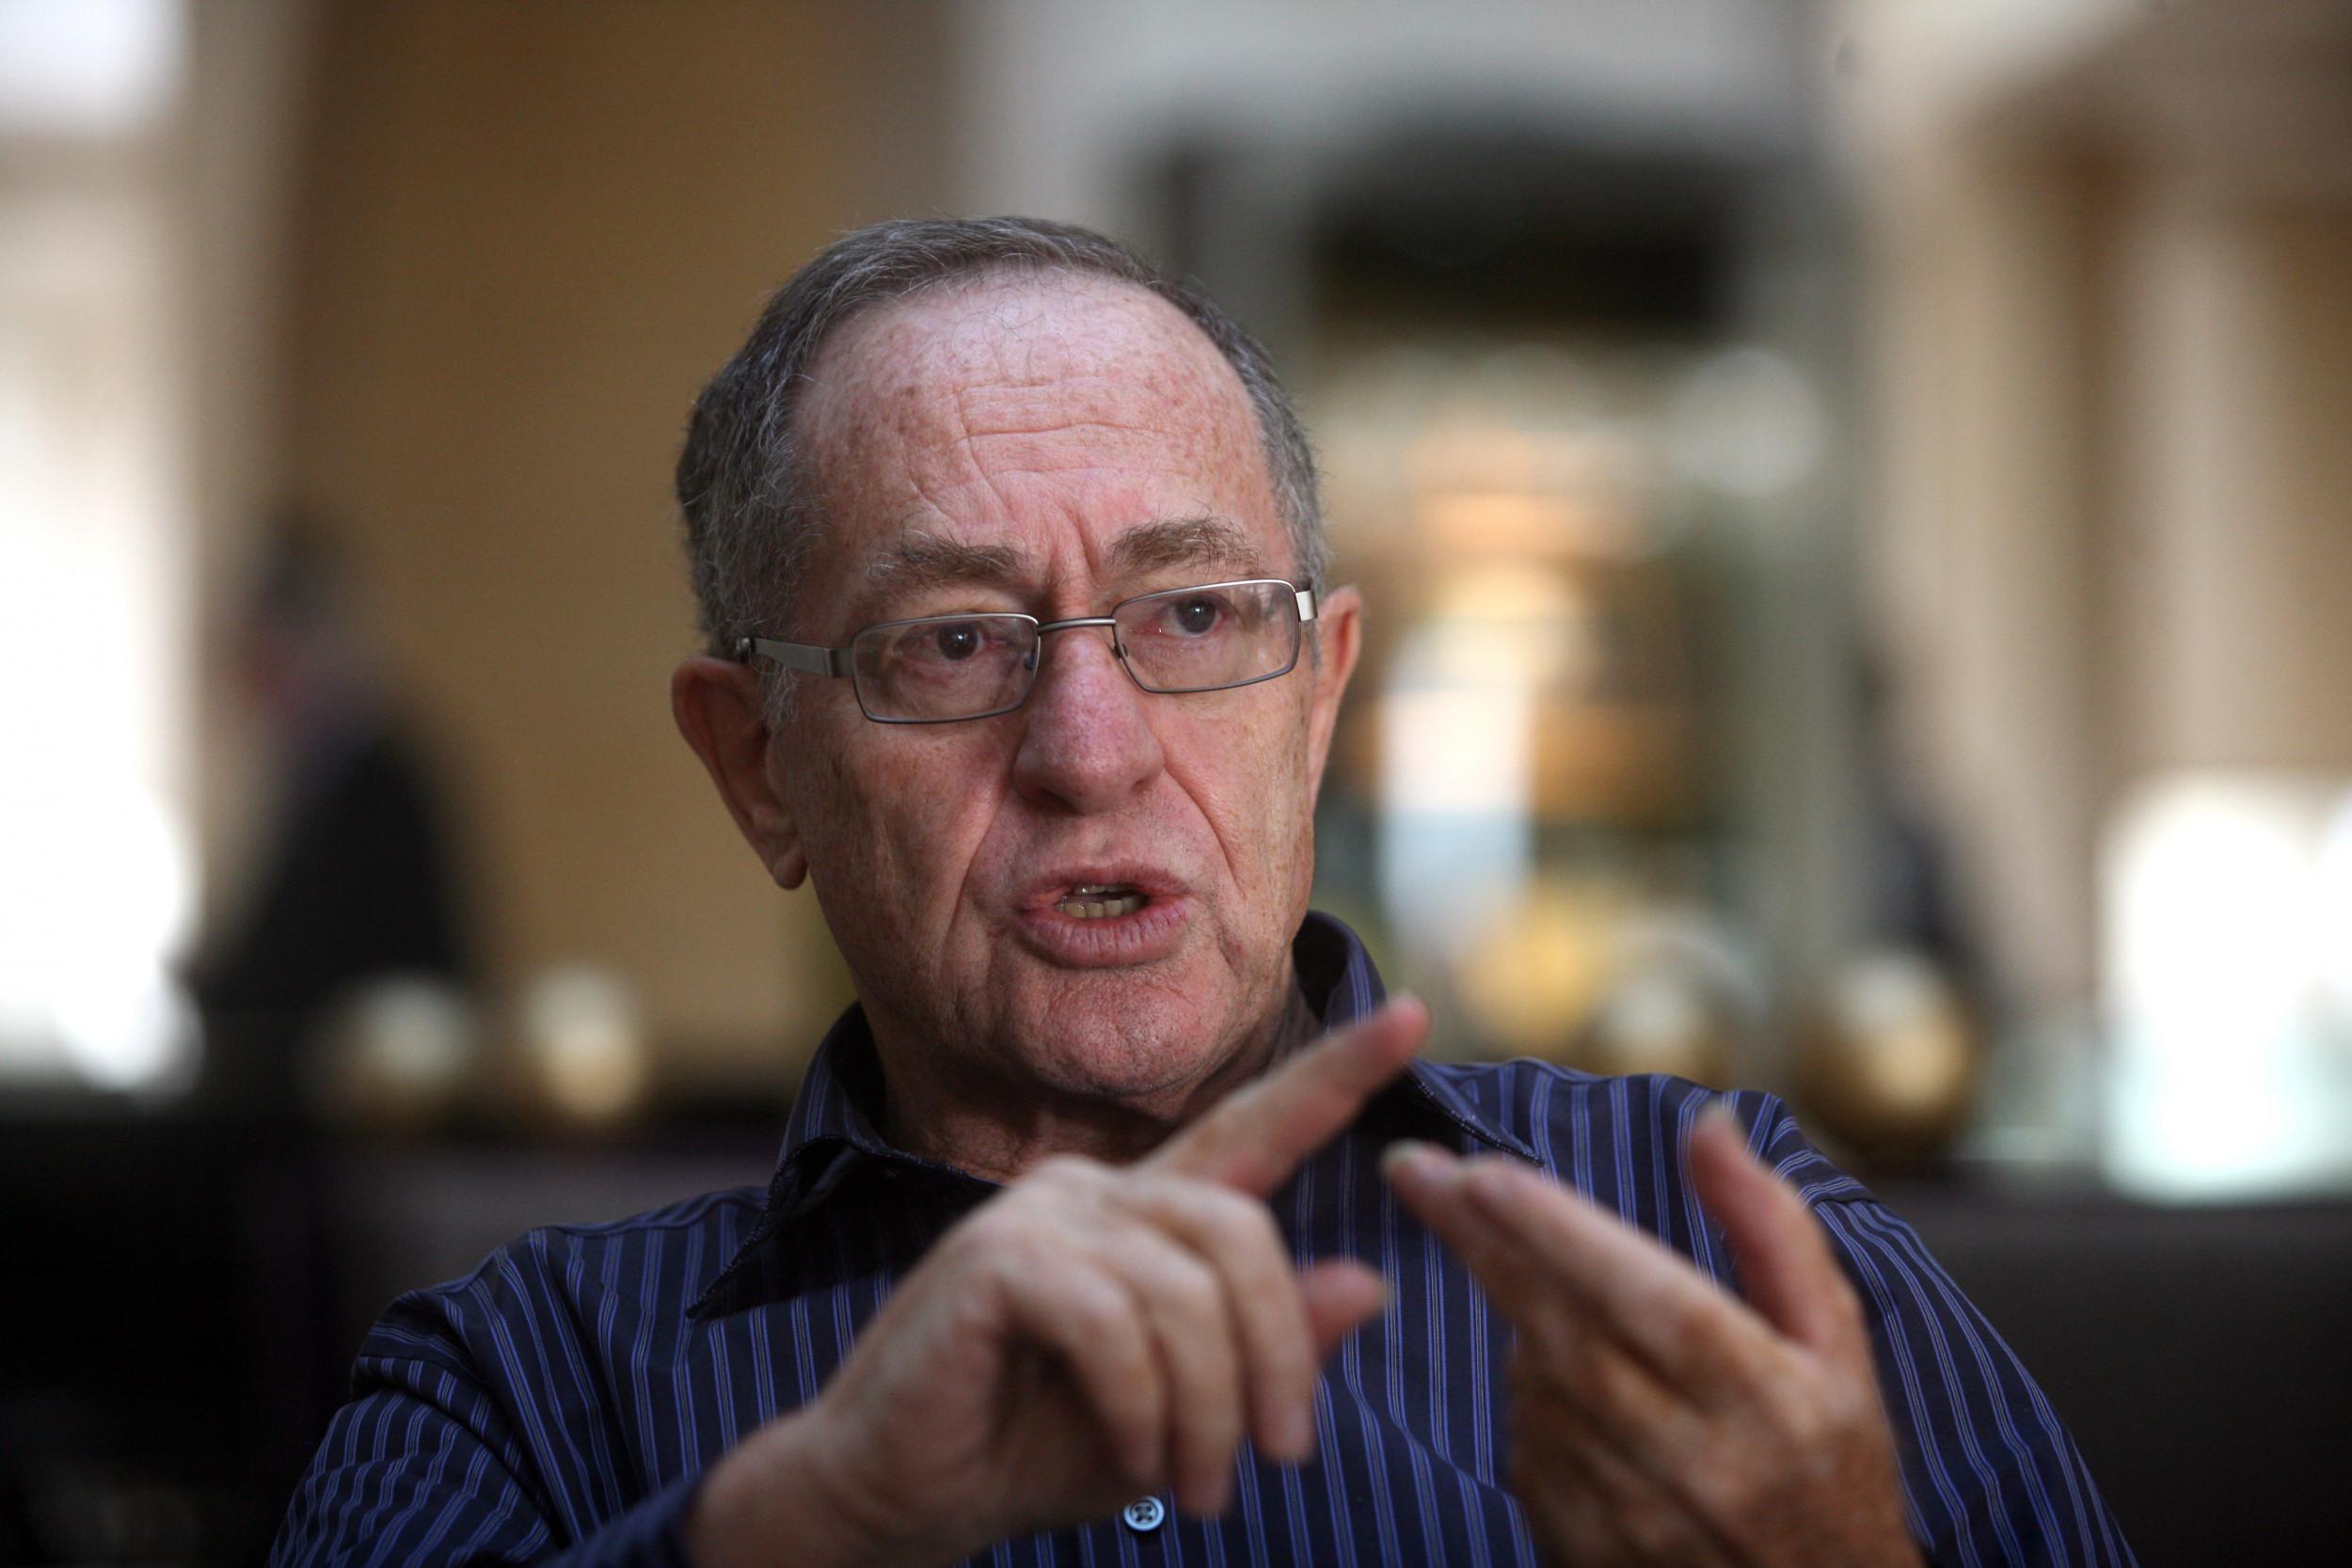 "Eric Swalwell's lawsuit against Trump has ""mind-boggling"" implications, says Alan Dershowitz"